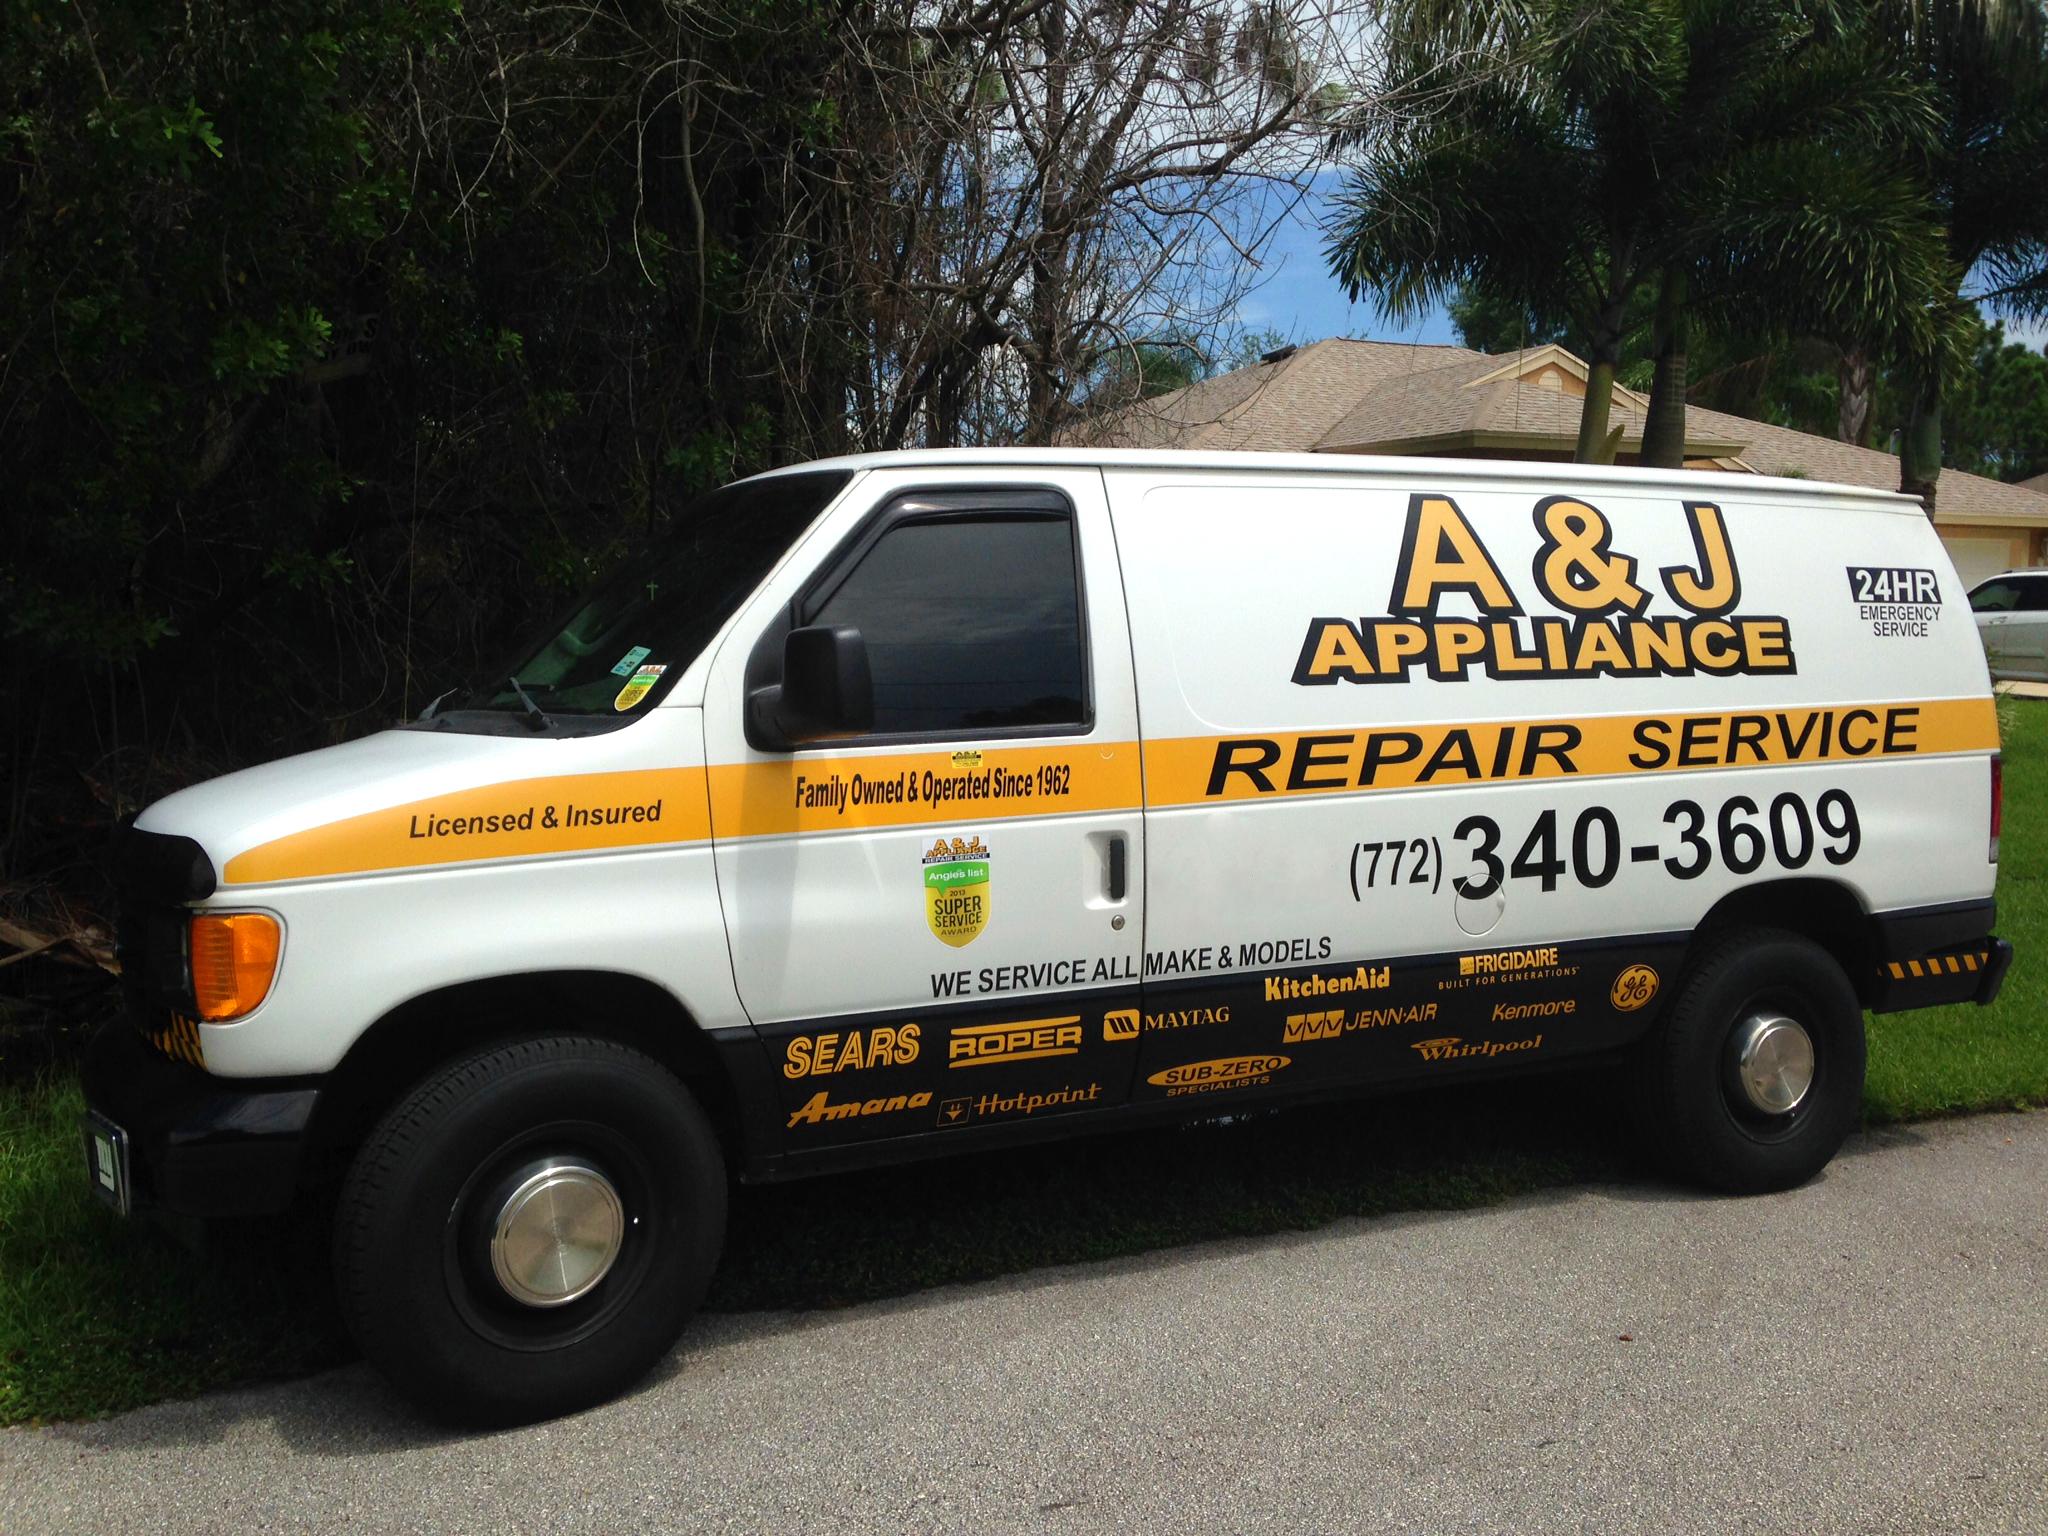 A & J Appliance Repair Service image 0